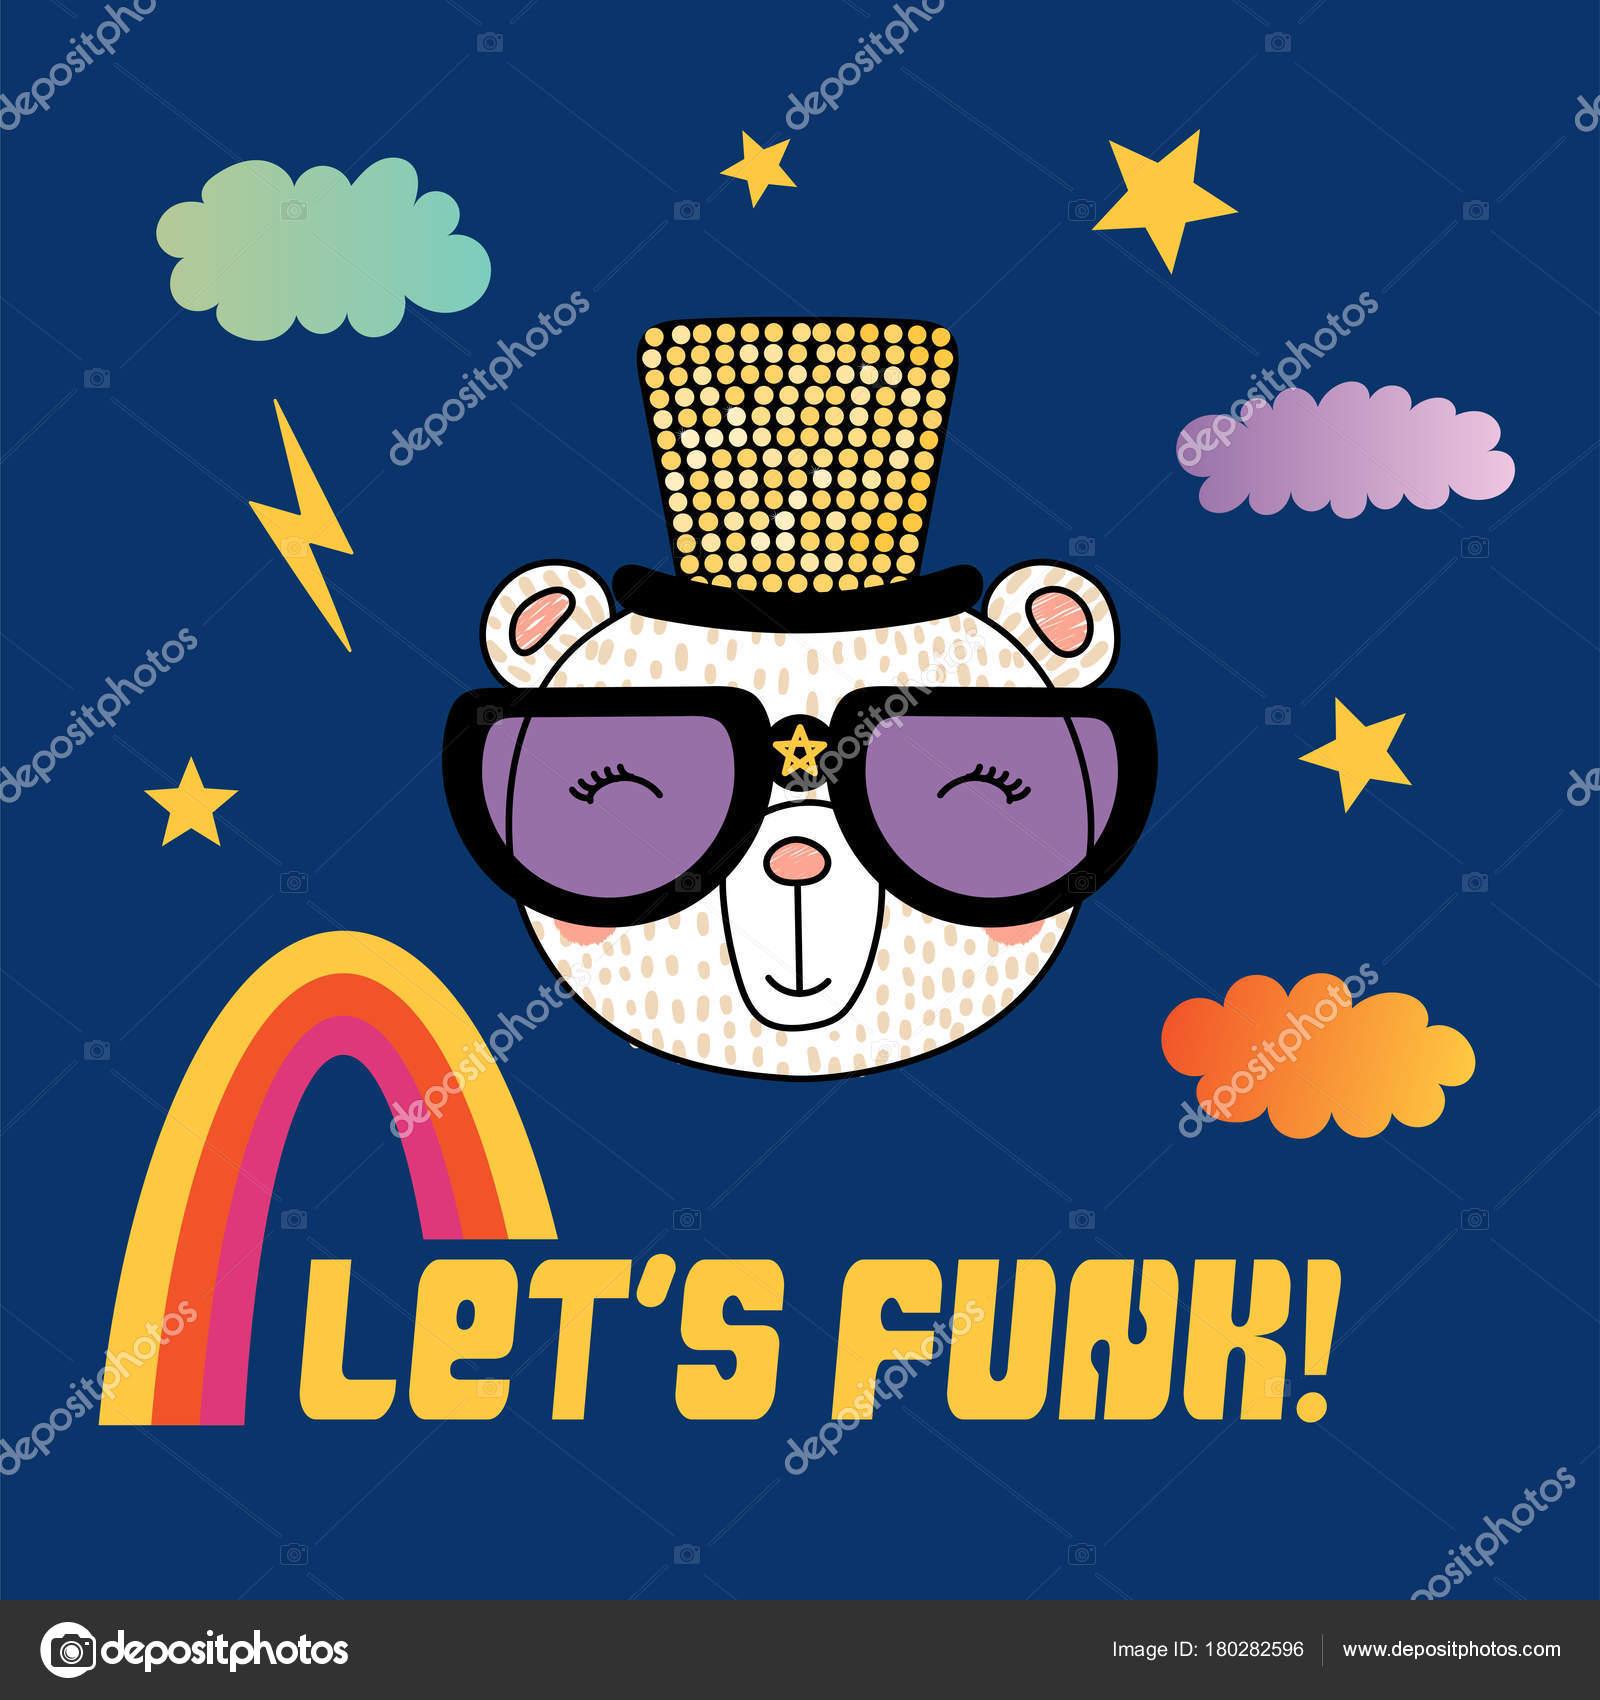 059cc0a3dc Χέρι Που Χαριτωμένα Αστεία Κινούμενα Σχέδια Αρκούδα Funky Καπέλο Και — Διανυσματικό  Αρχείο